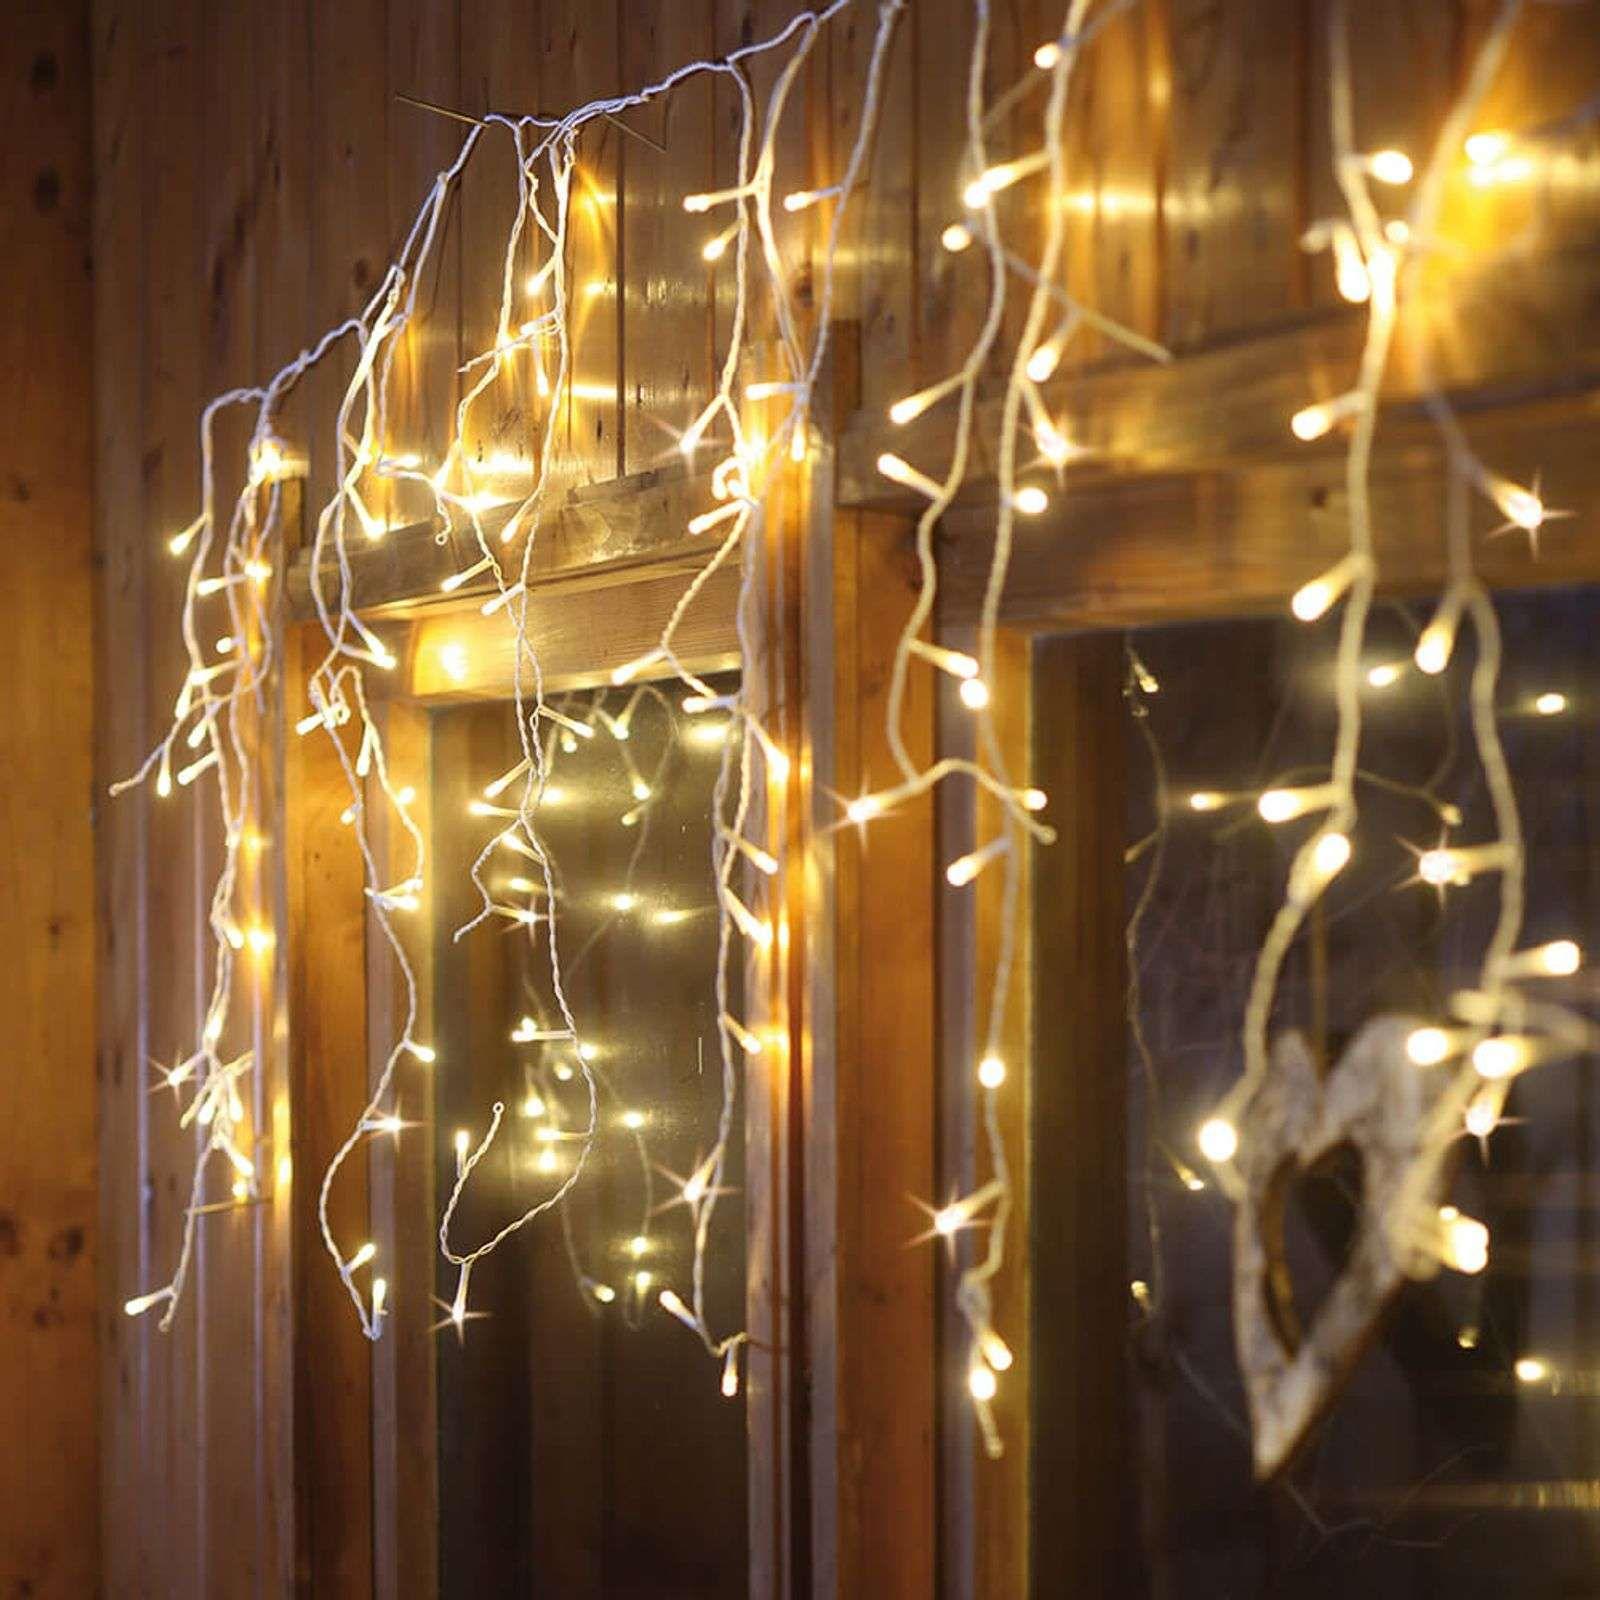 Tenda Luminosa Led Di Colore Bianco Caldo Di Hellum Led Lichtvorhang Und Lampen